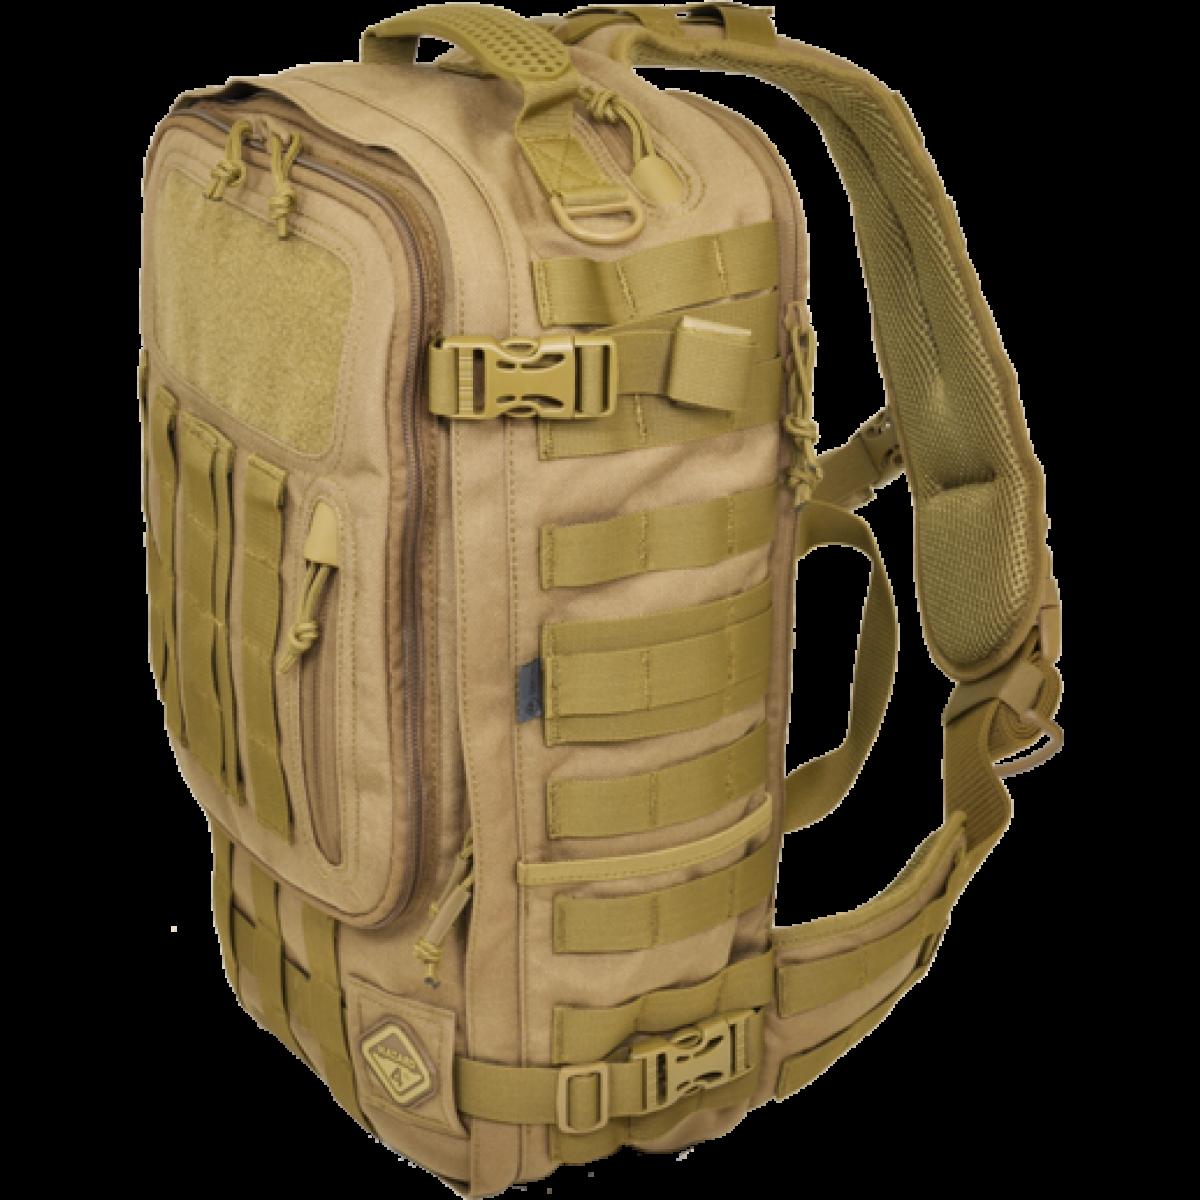 Backpack PNG image